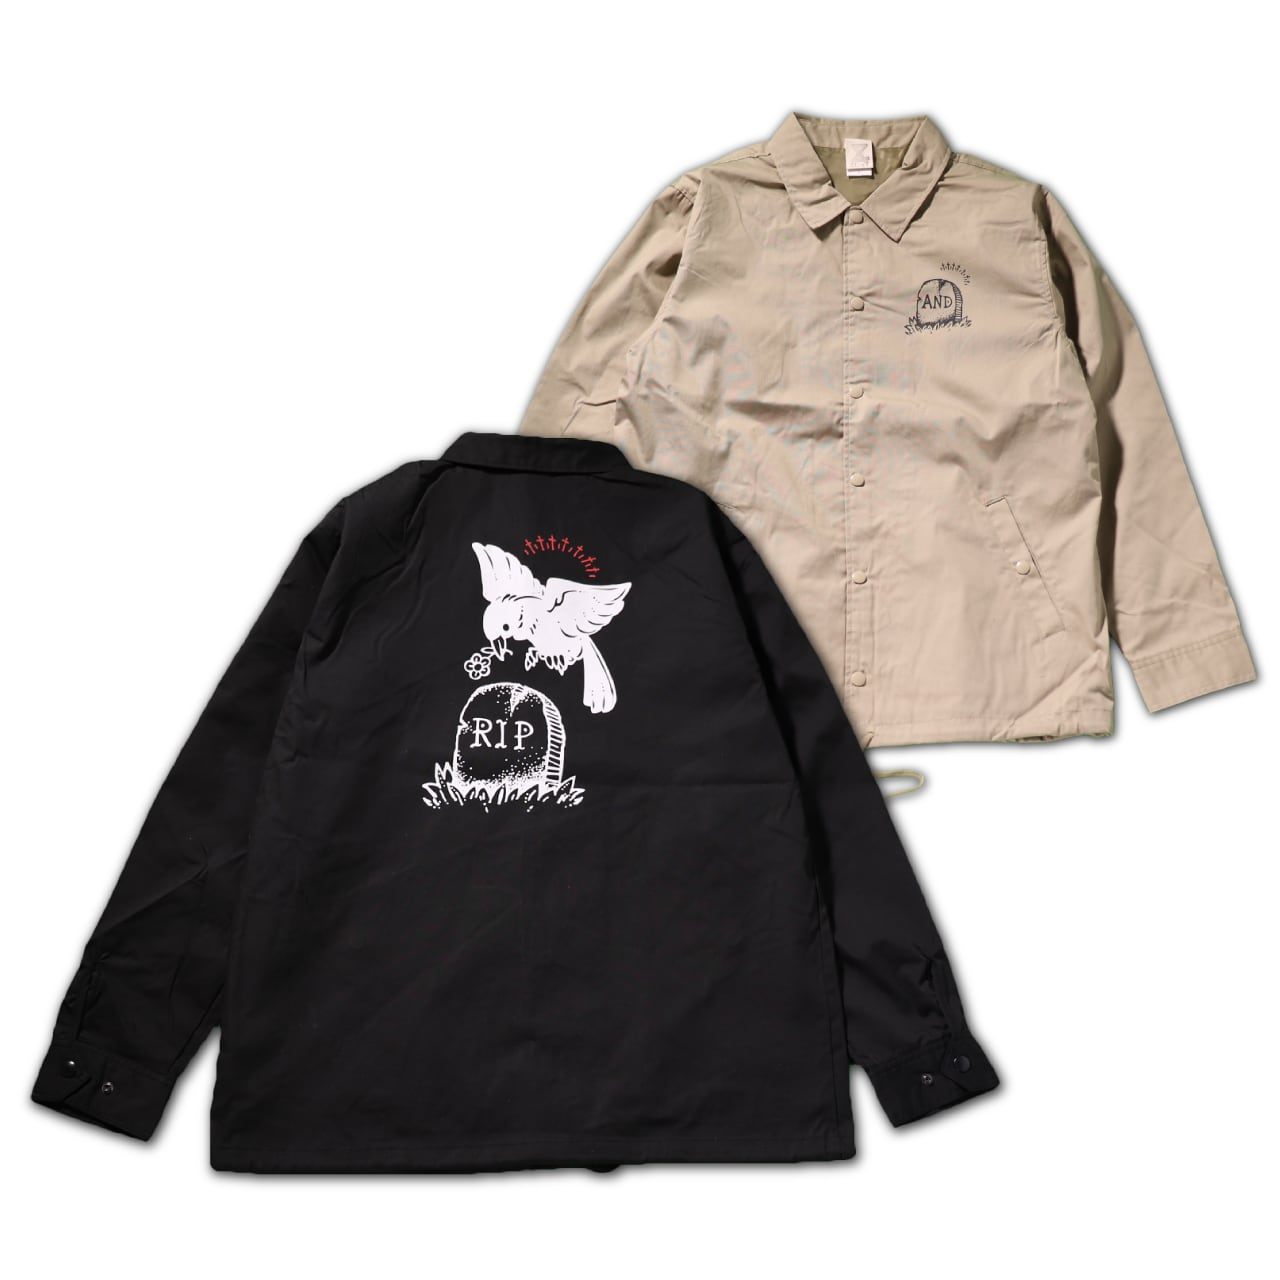 R.I.P. Coach jacket